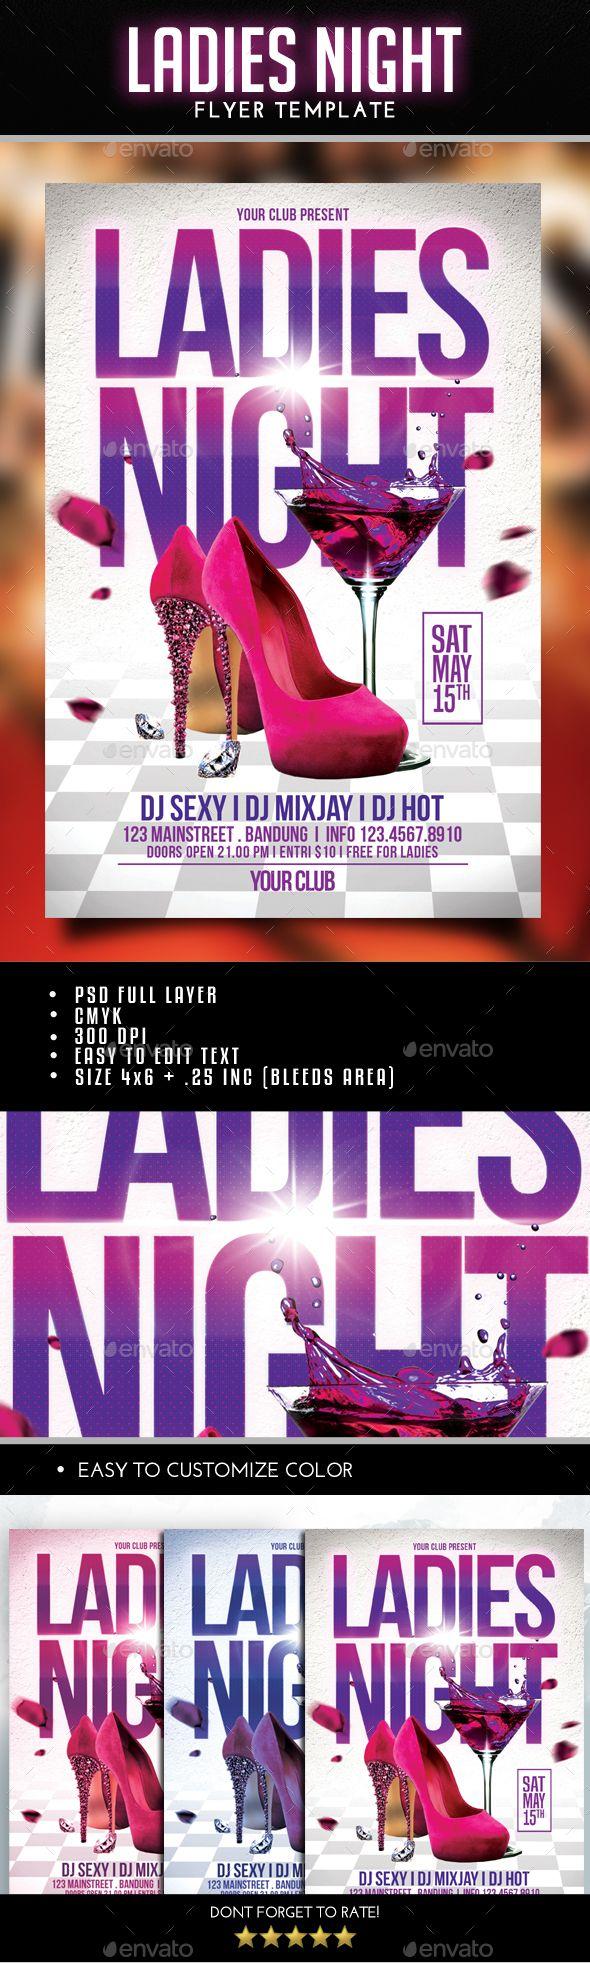 Ladies Night Flyer -  Download Here: http://graphicriver.net/item/ladies-night-flyer/14982202